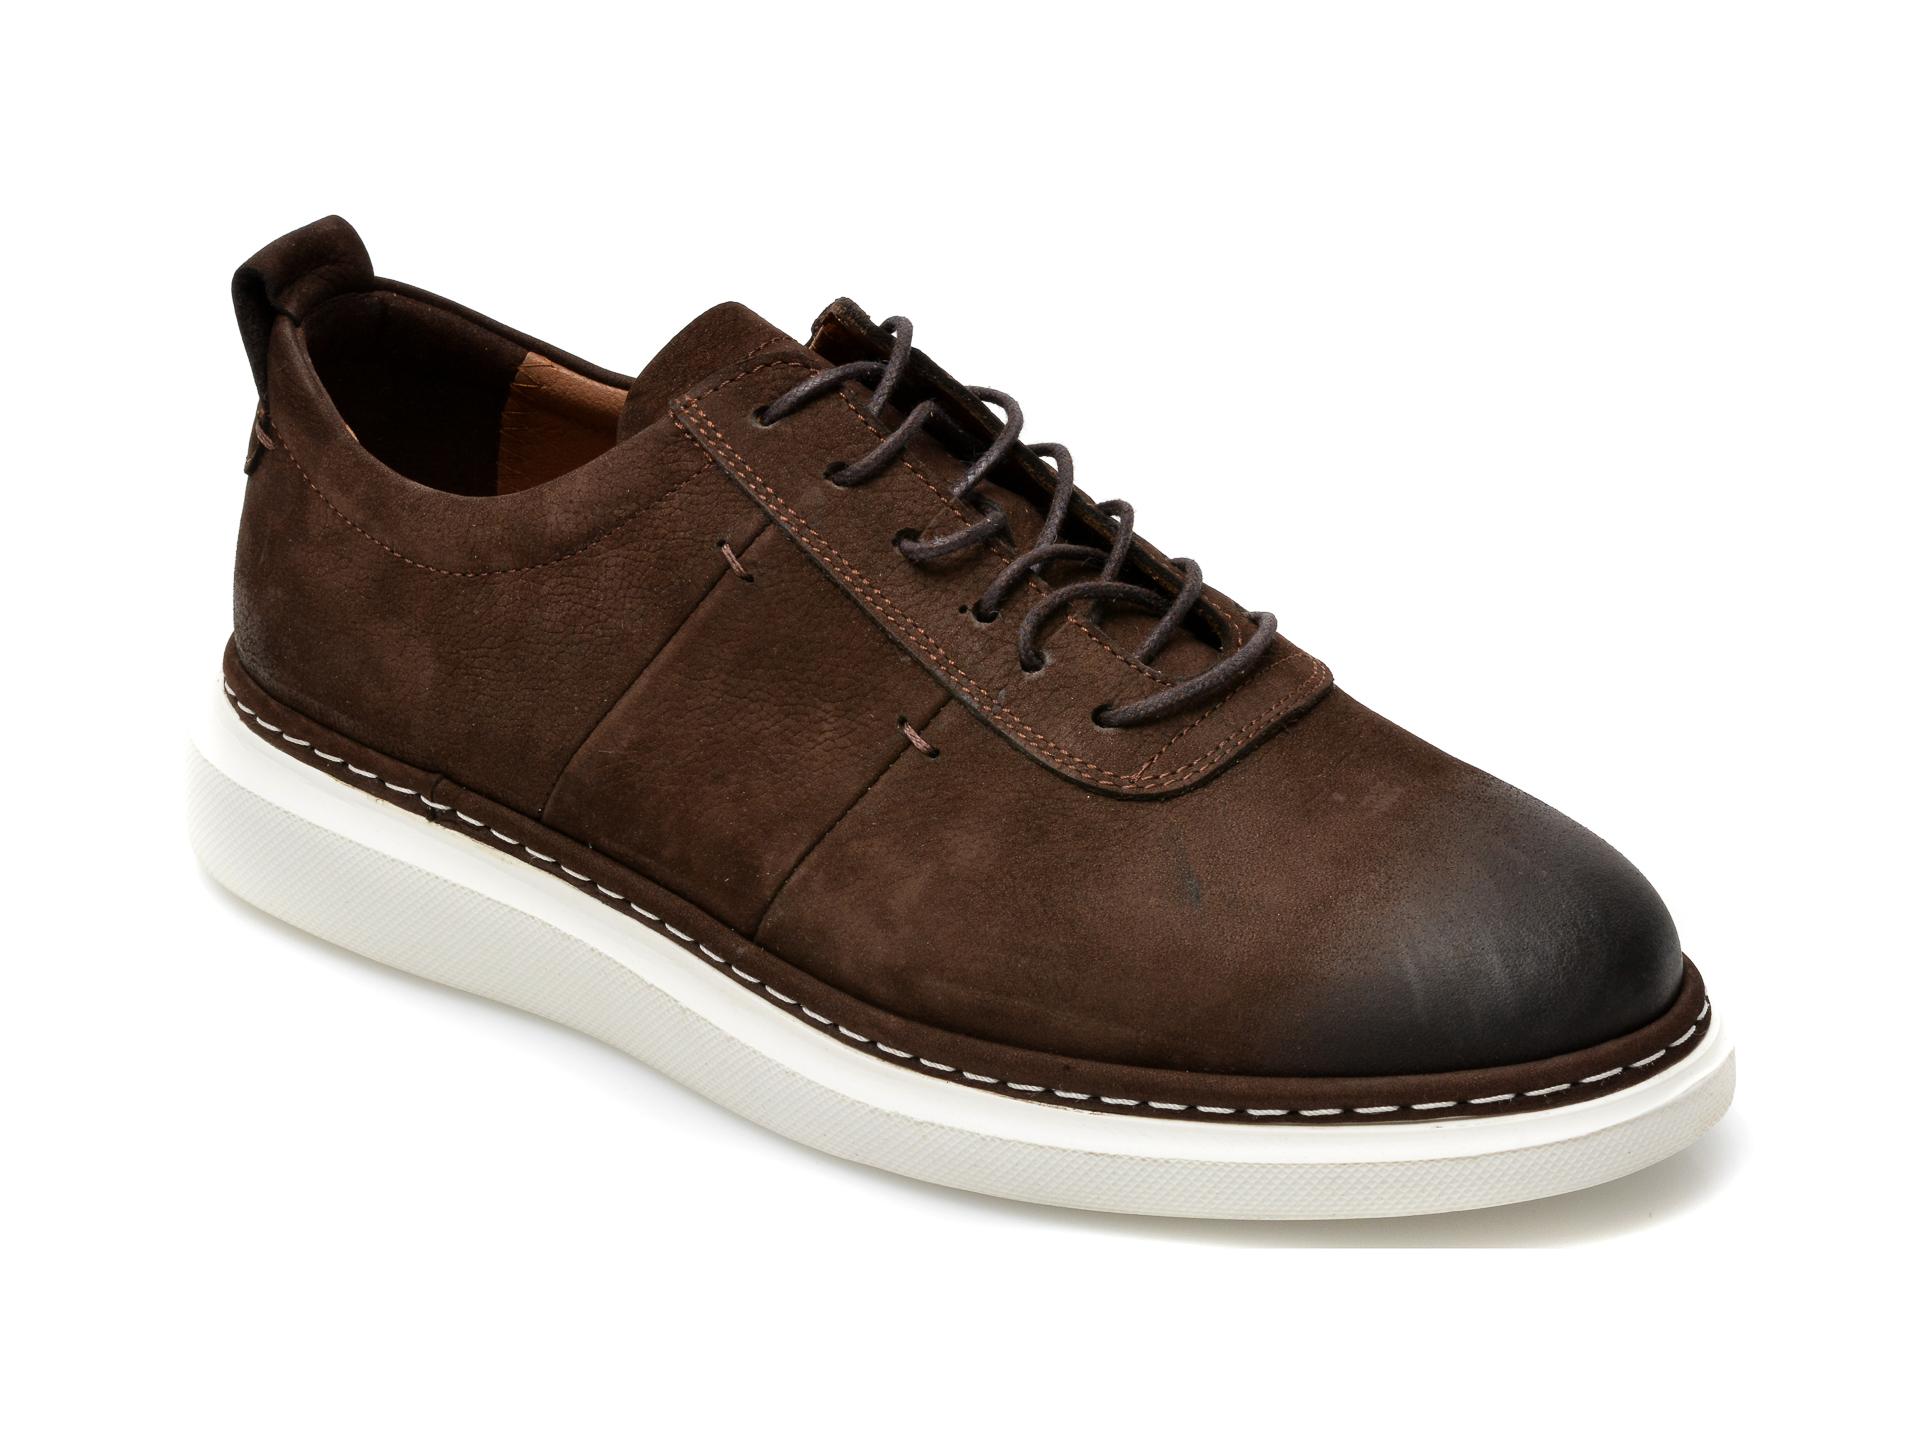 Pantofi OTTER maro inchis, 21KL803, din nabuc imagine otter.ro